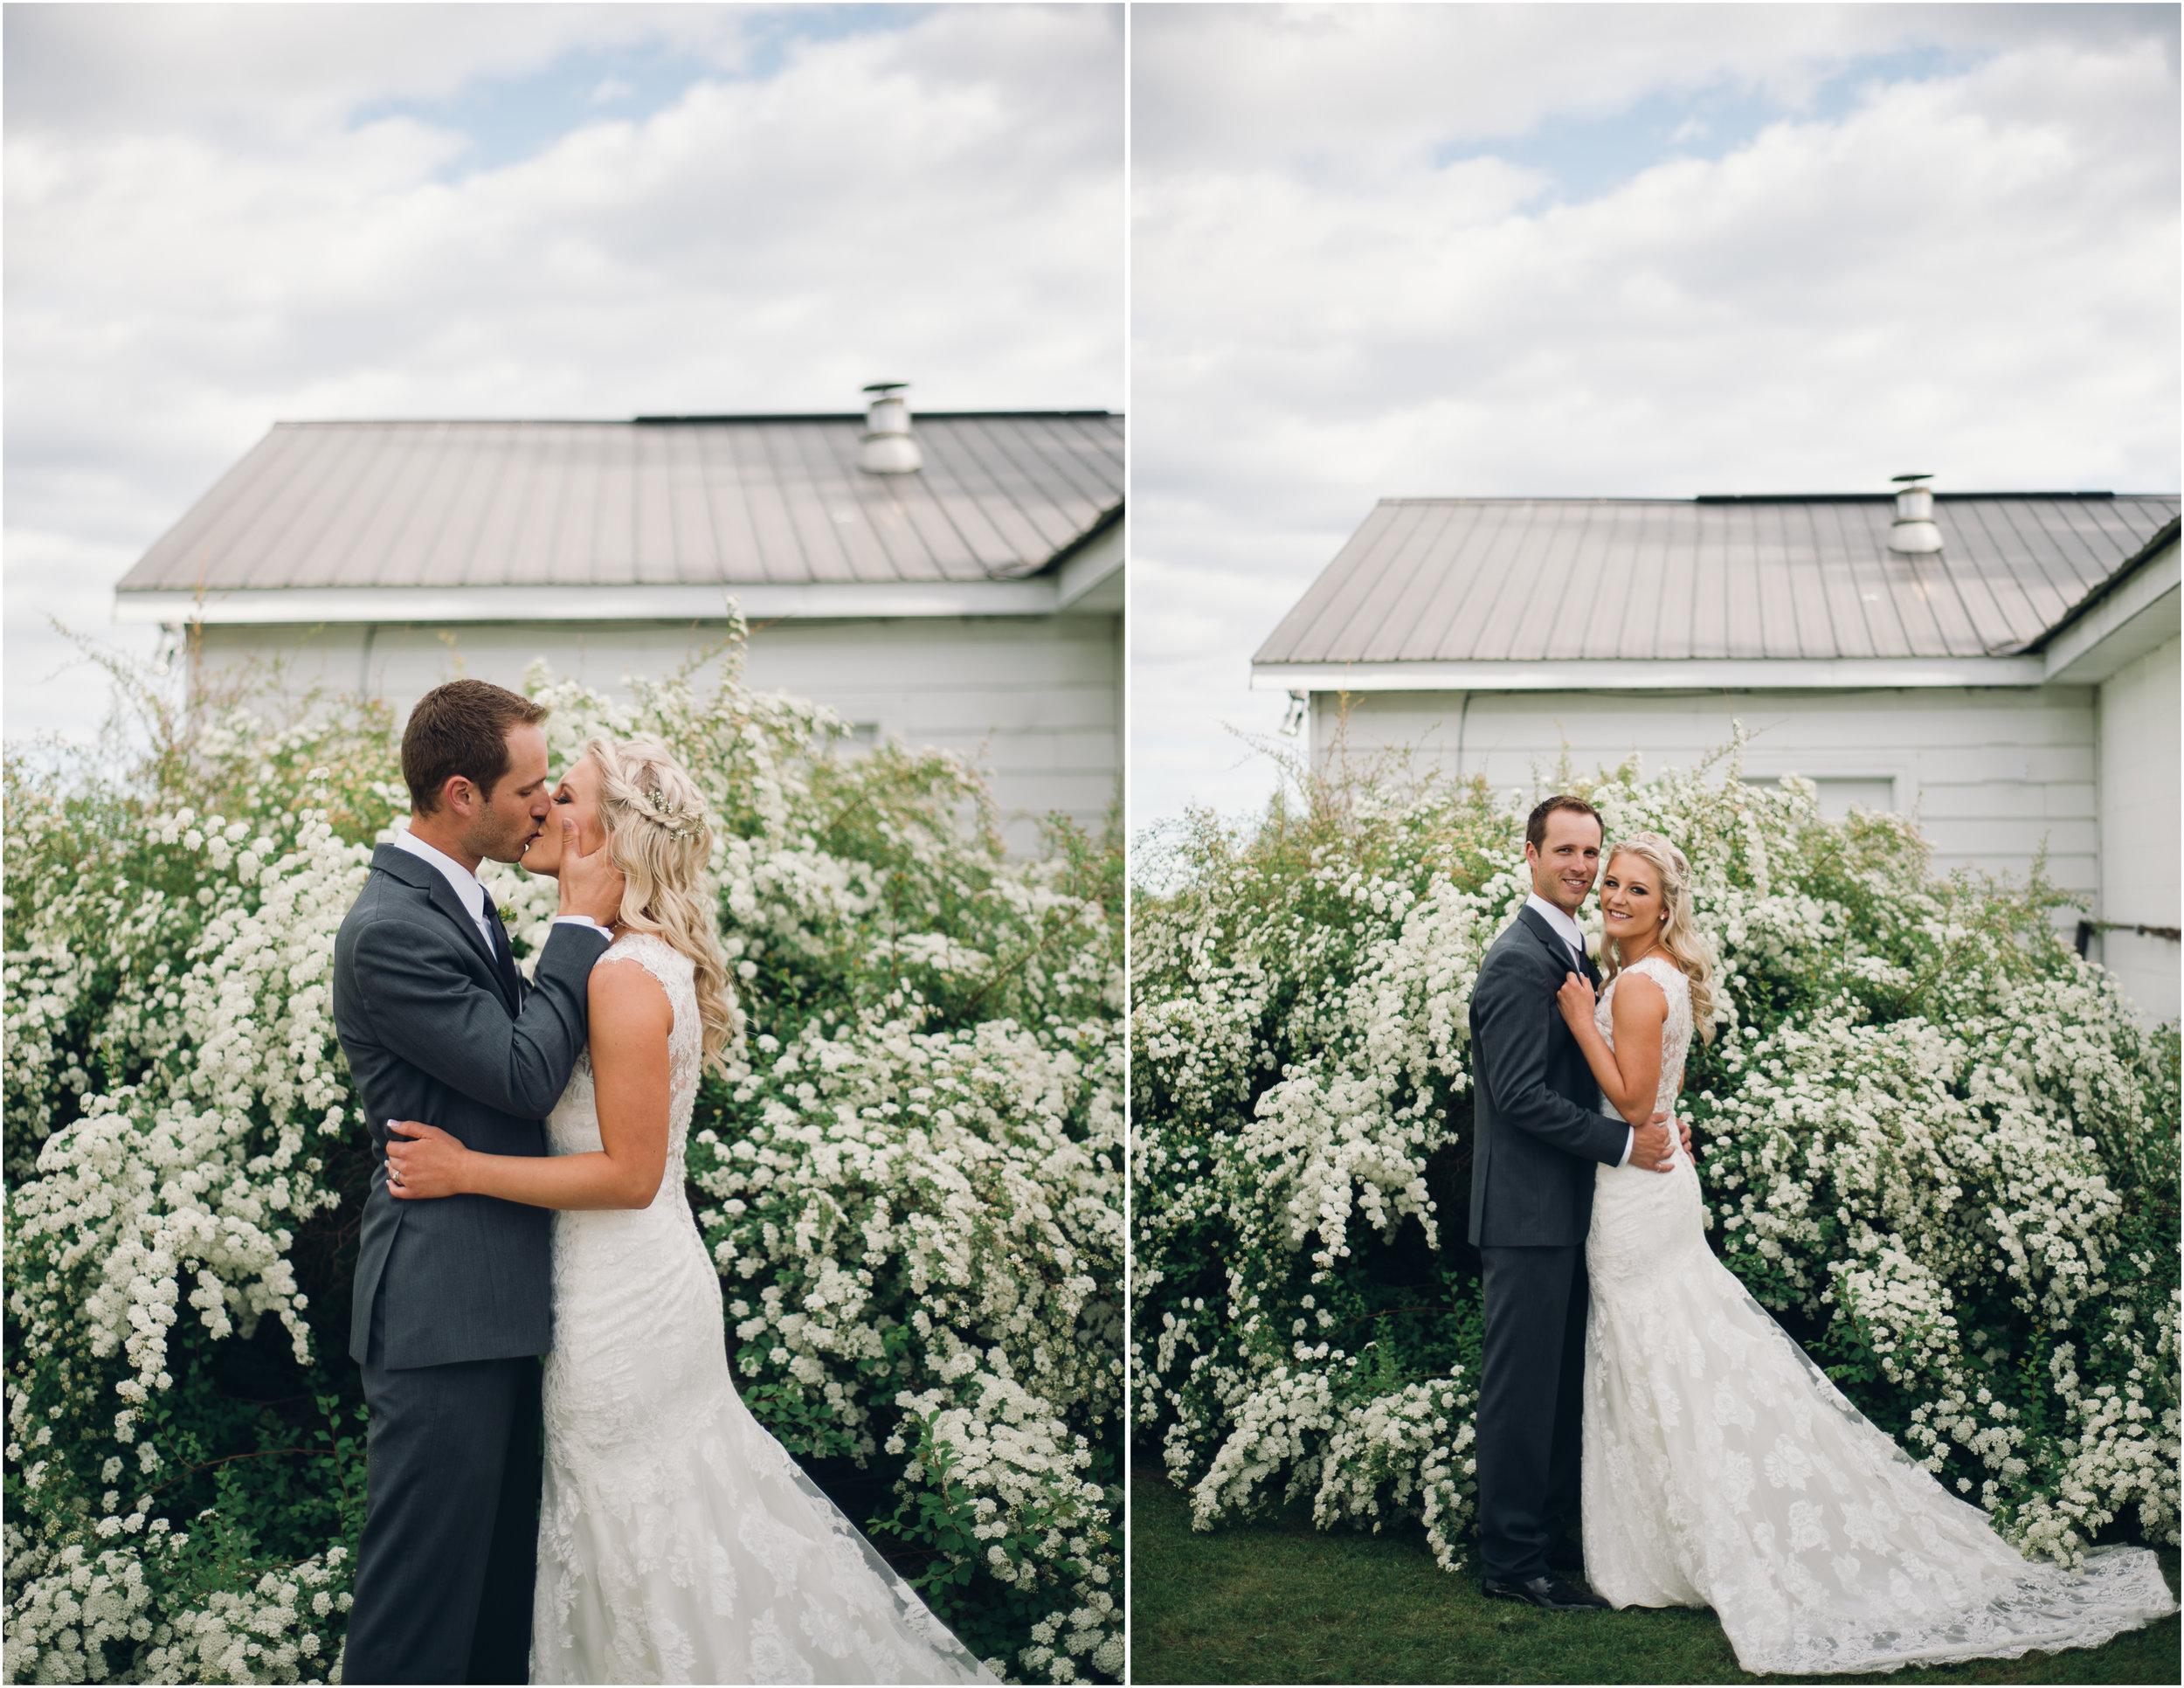 Kingston Wedding_2x2_7.jpg